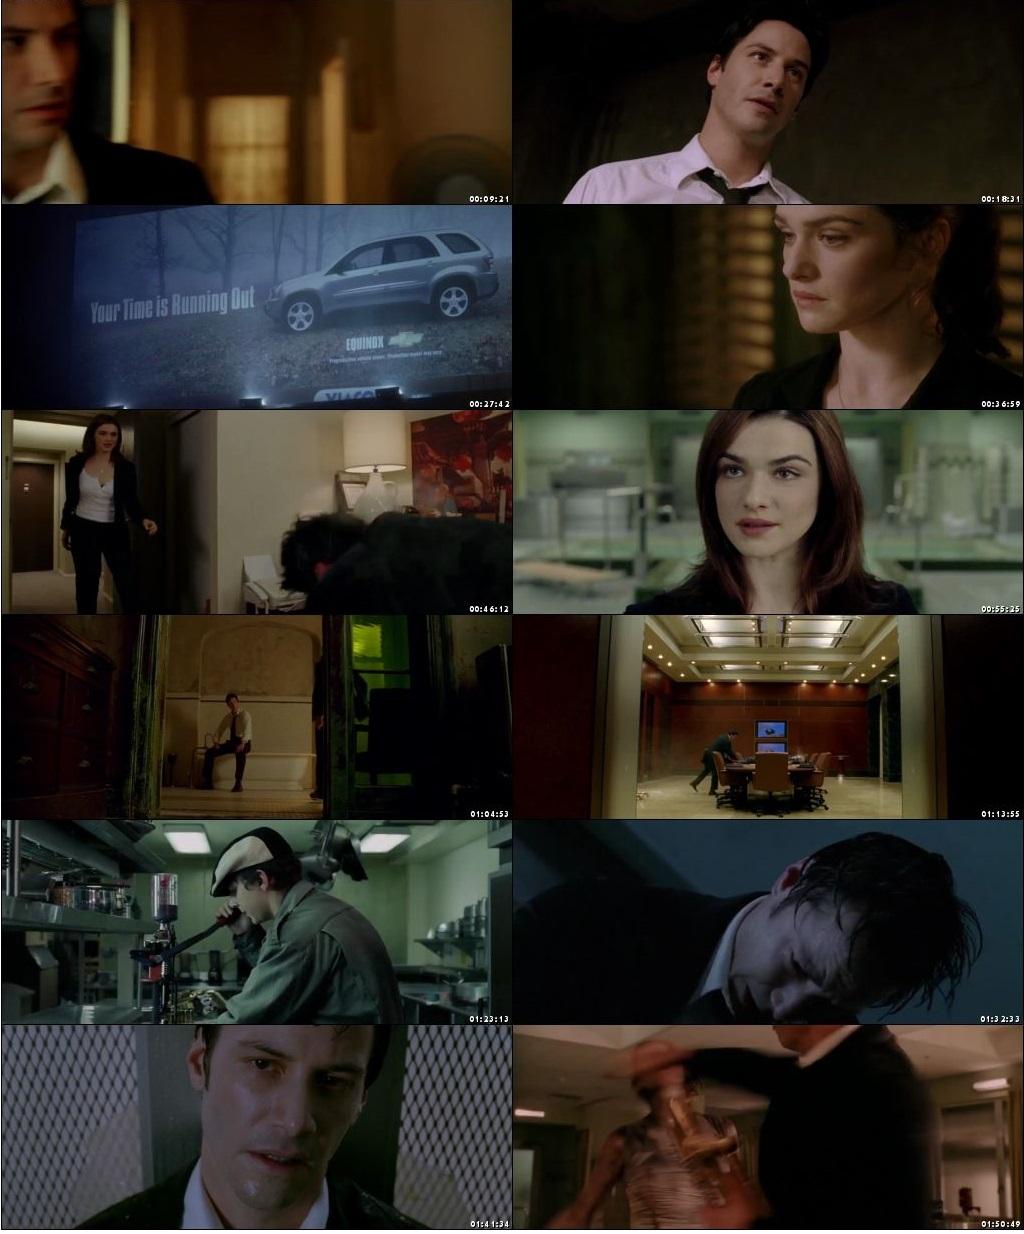 Constantine 2005 Dual Audio 720p BluRay X264 [Hindi